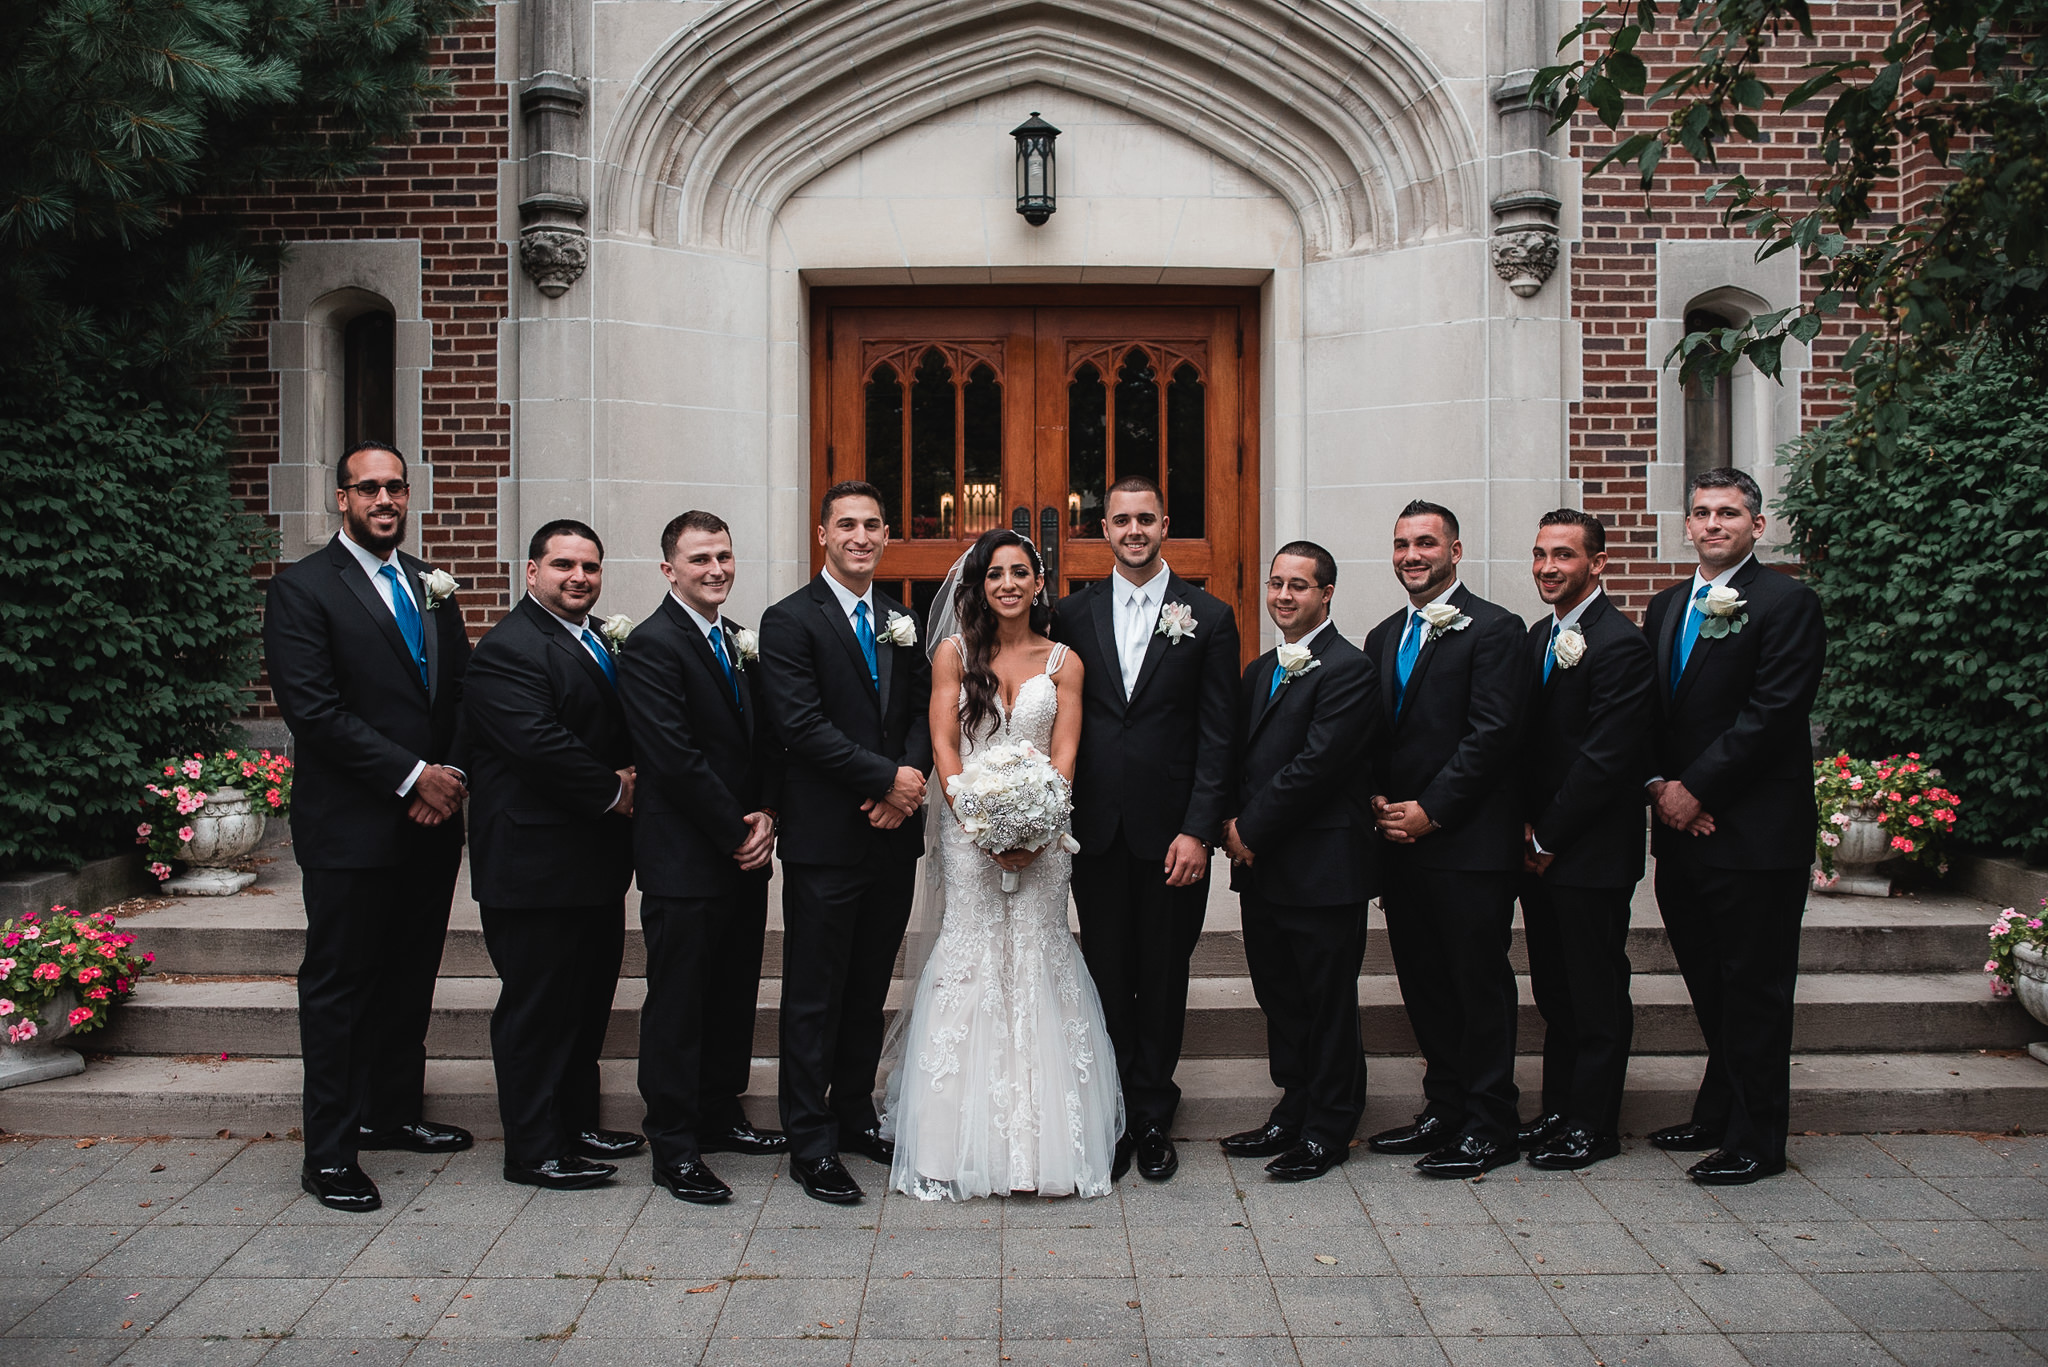 NN_ILTULIPANO_WEDDING_NEW_JERSEY_2819.jpg